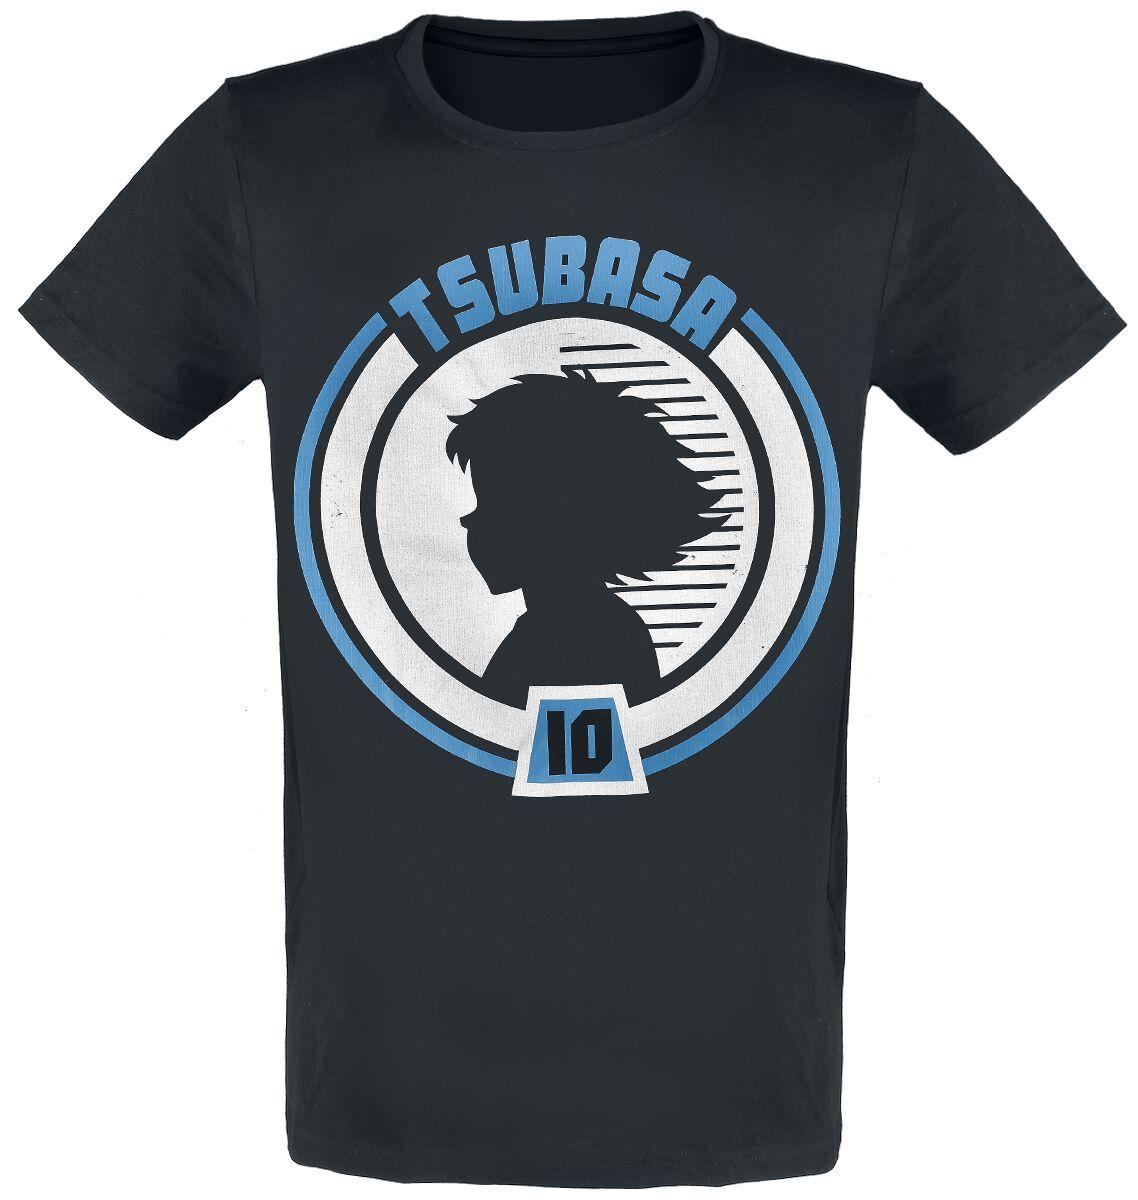 Captain Tsubasa Tsubasa Badge T-Shirt schwarz TS356311CTS